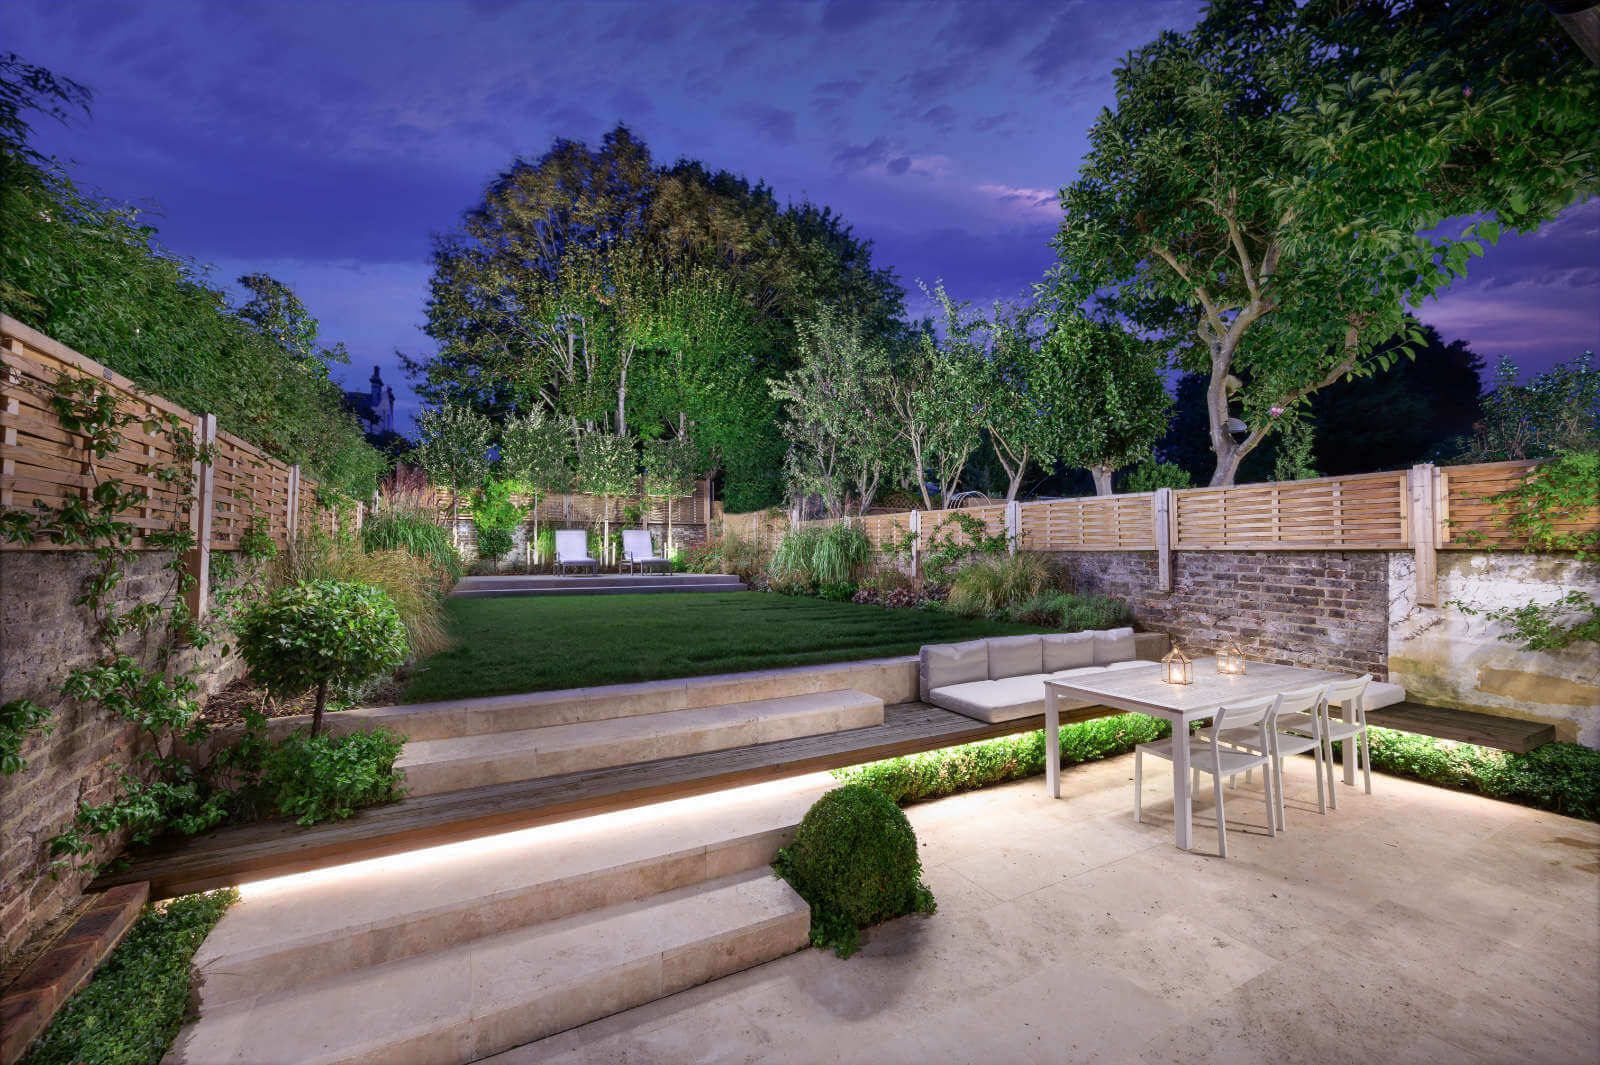 Alternating Garden - Photo 1